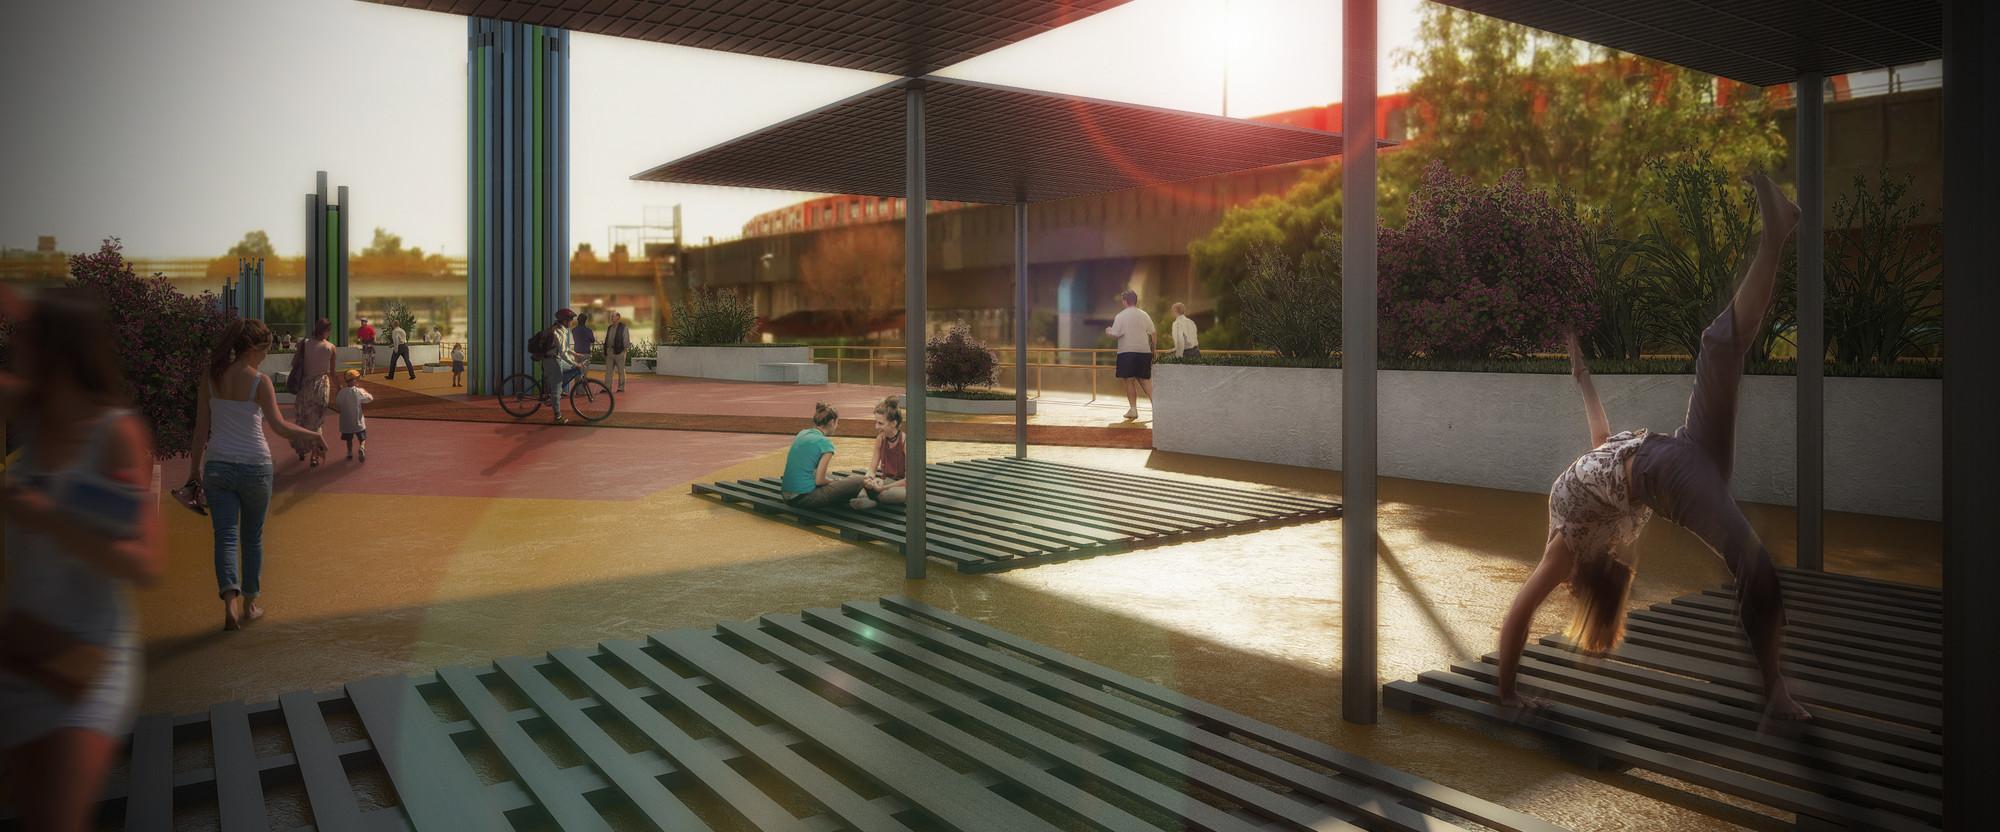 Vista desde Av. Río Churubusco y Calle Norte / © Victor Betanzos, Marcos Betanzos, Cinthia Meléndez Xochicale, Guillermo González, Alfredo González y Carlos Verón